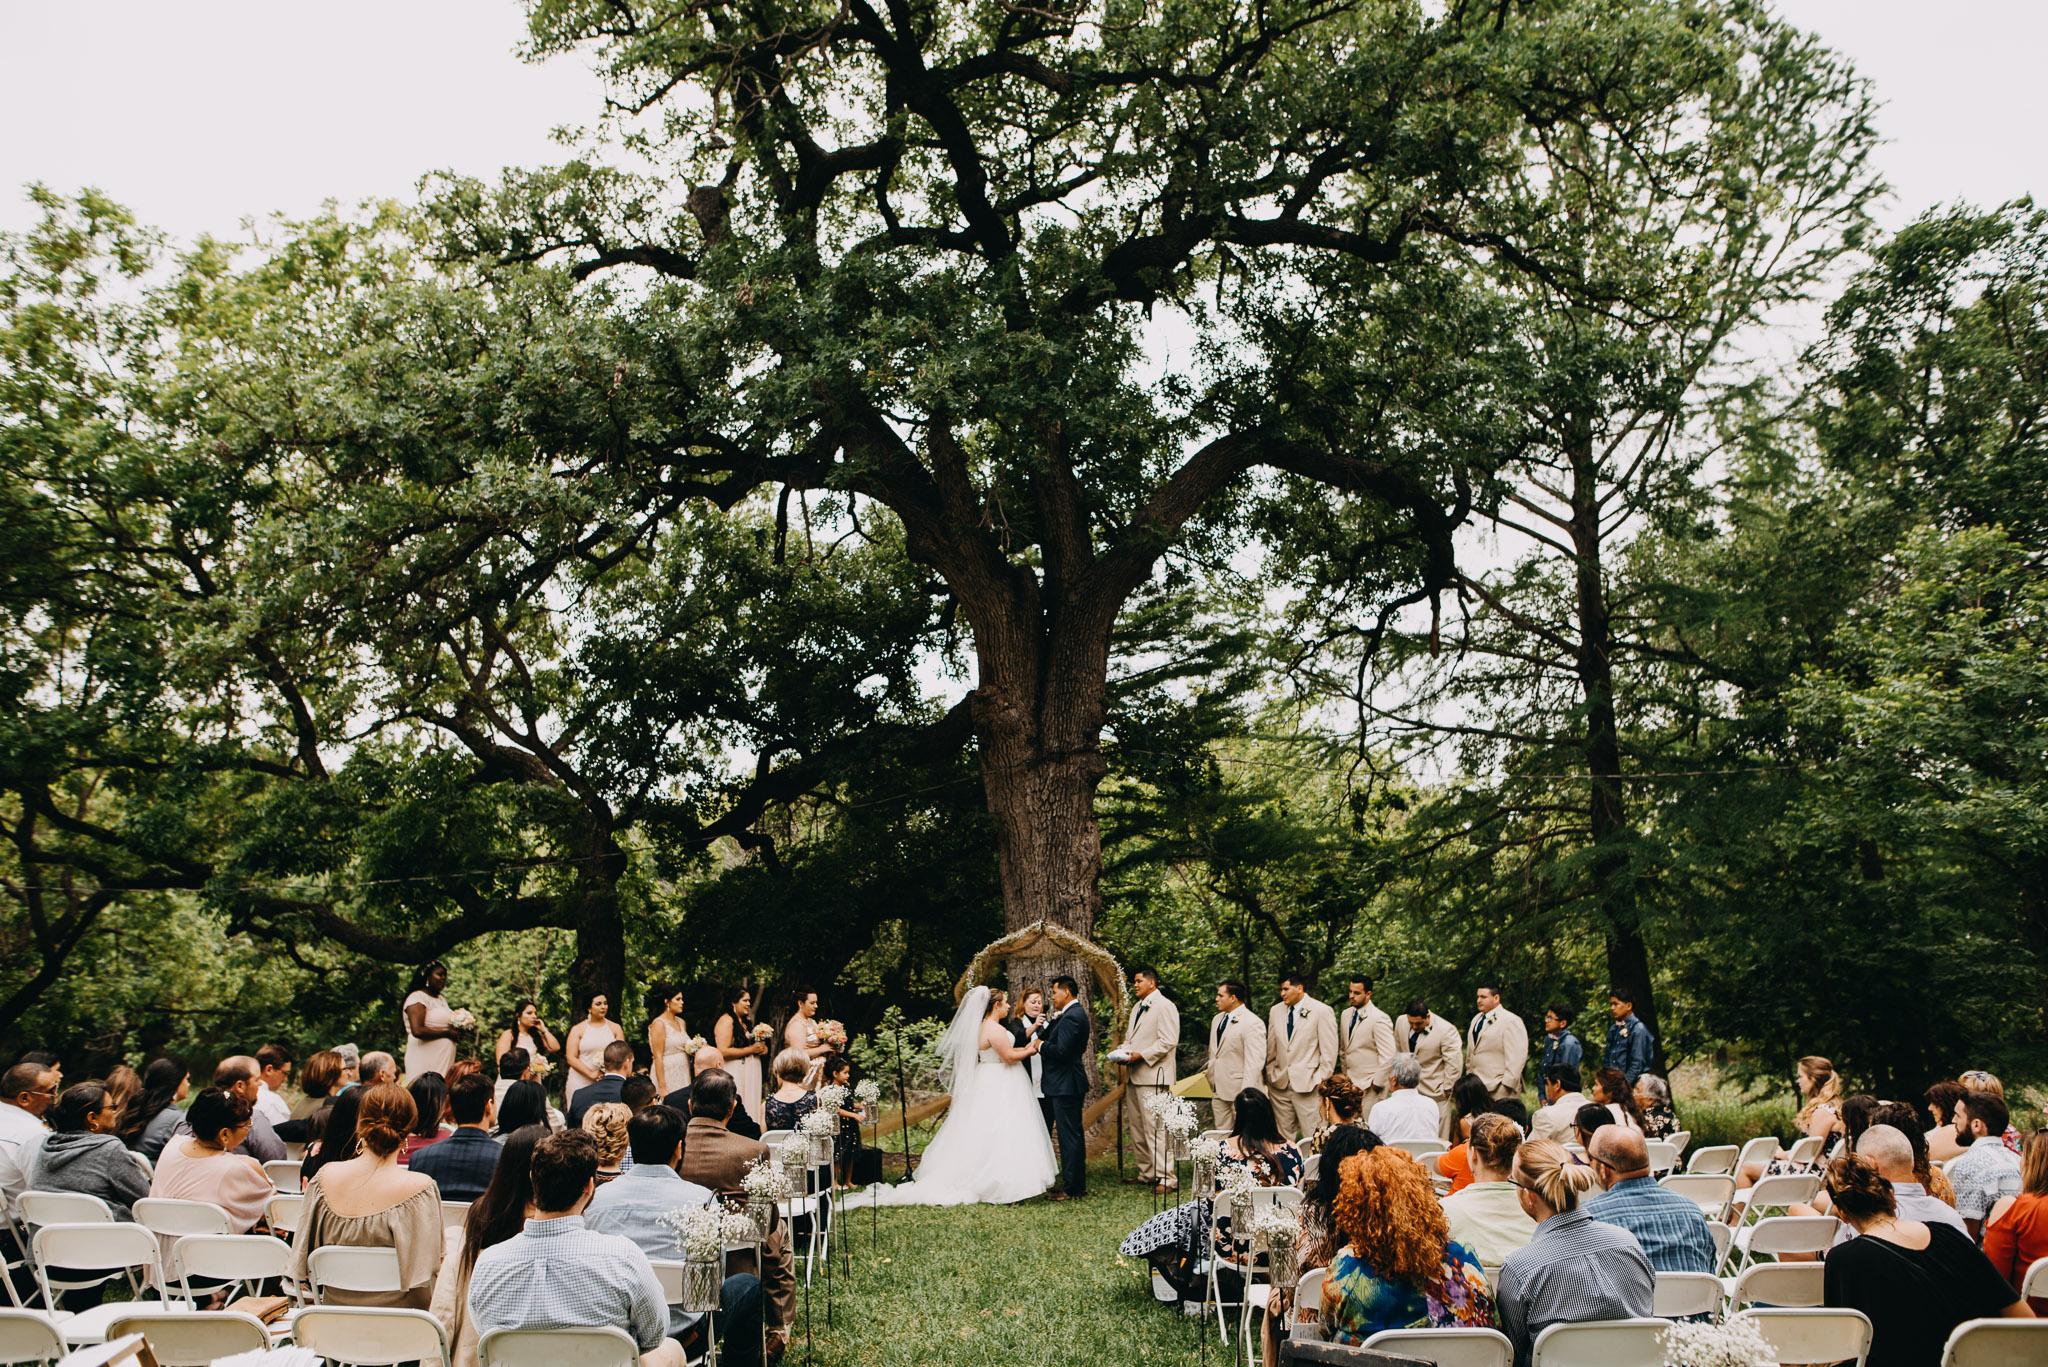 Christoval-Texas-Wedding_Photographer-Meghan&Tony-0015.jpg